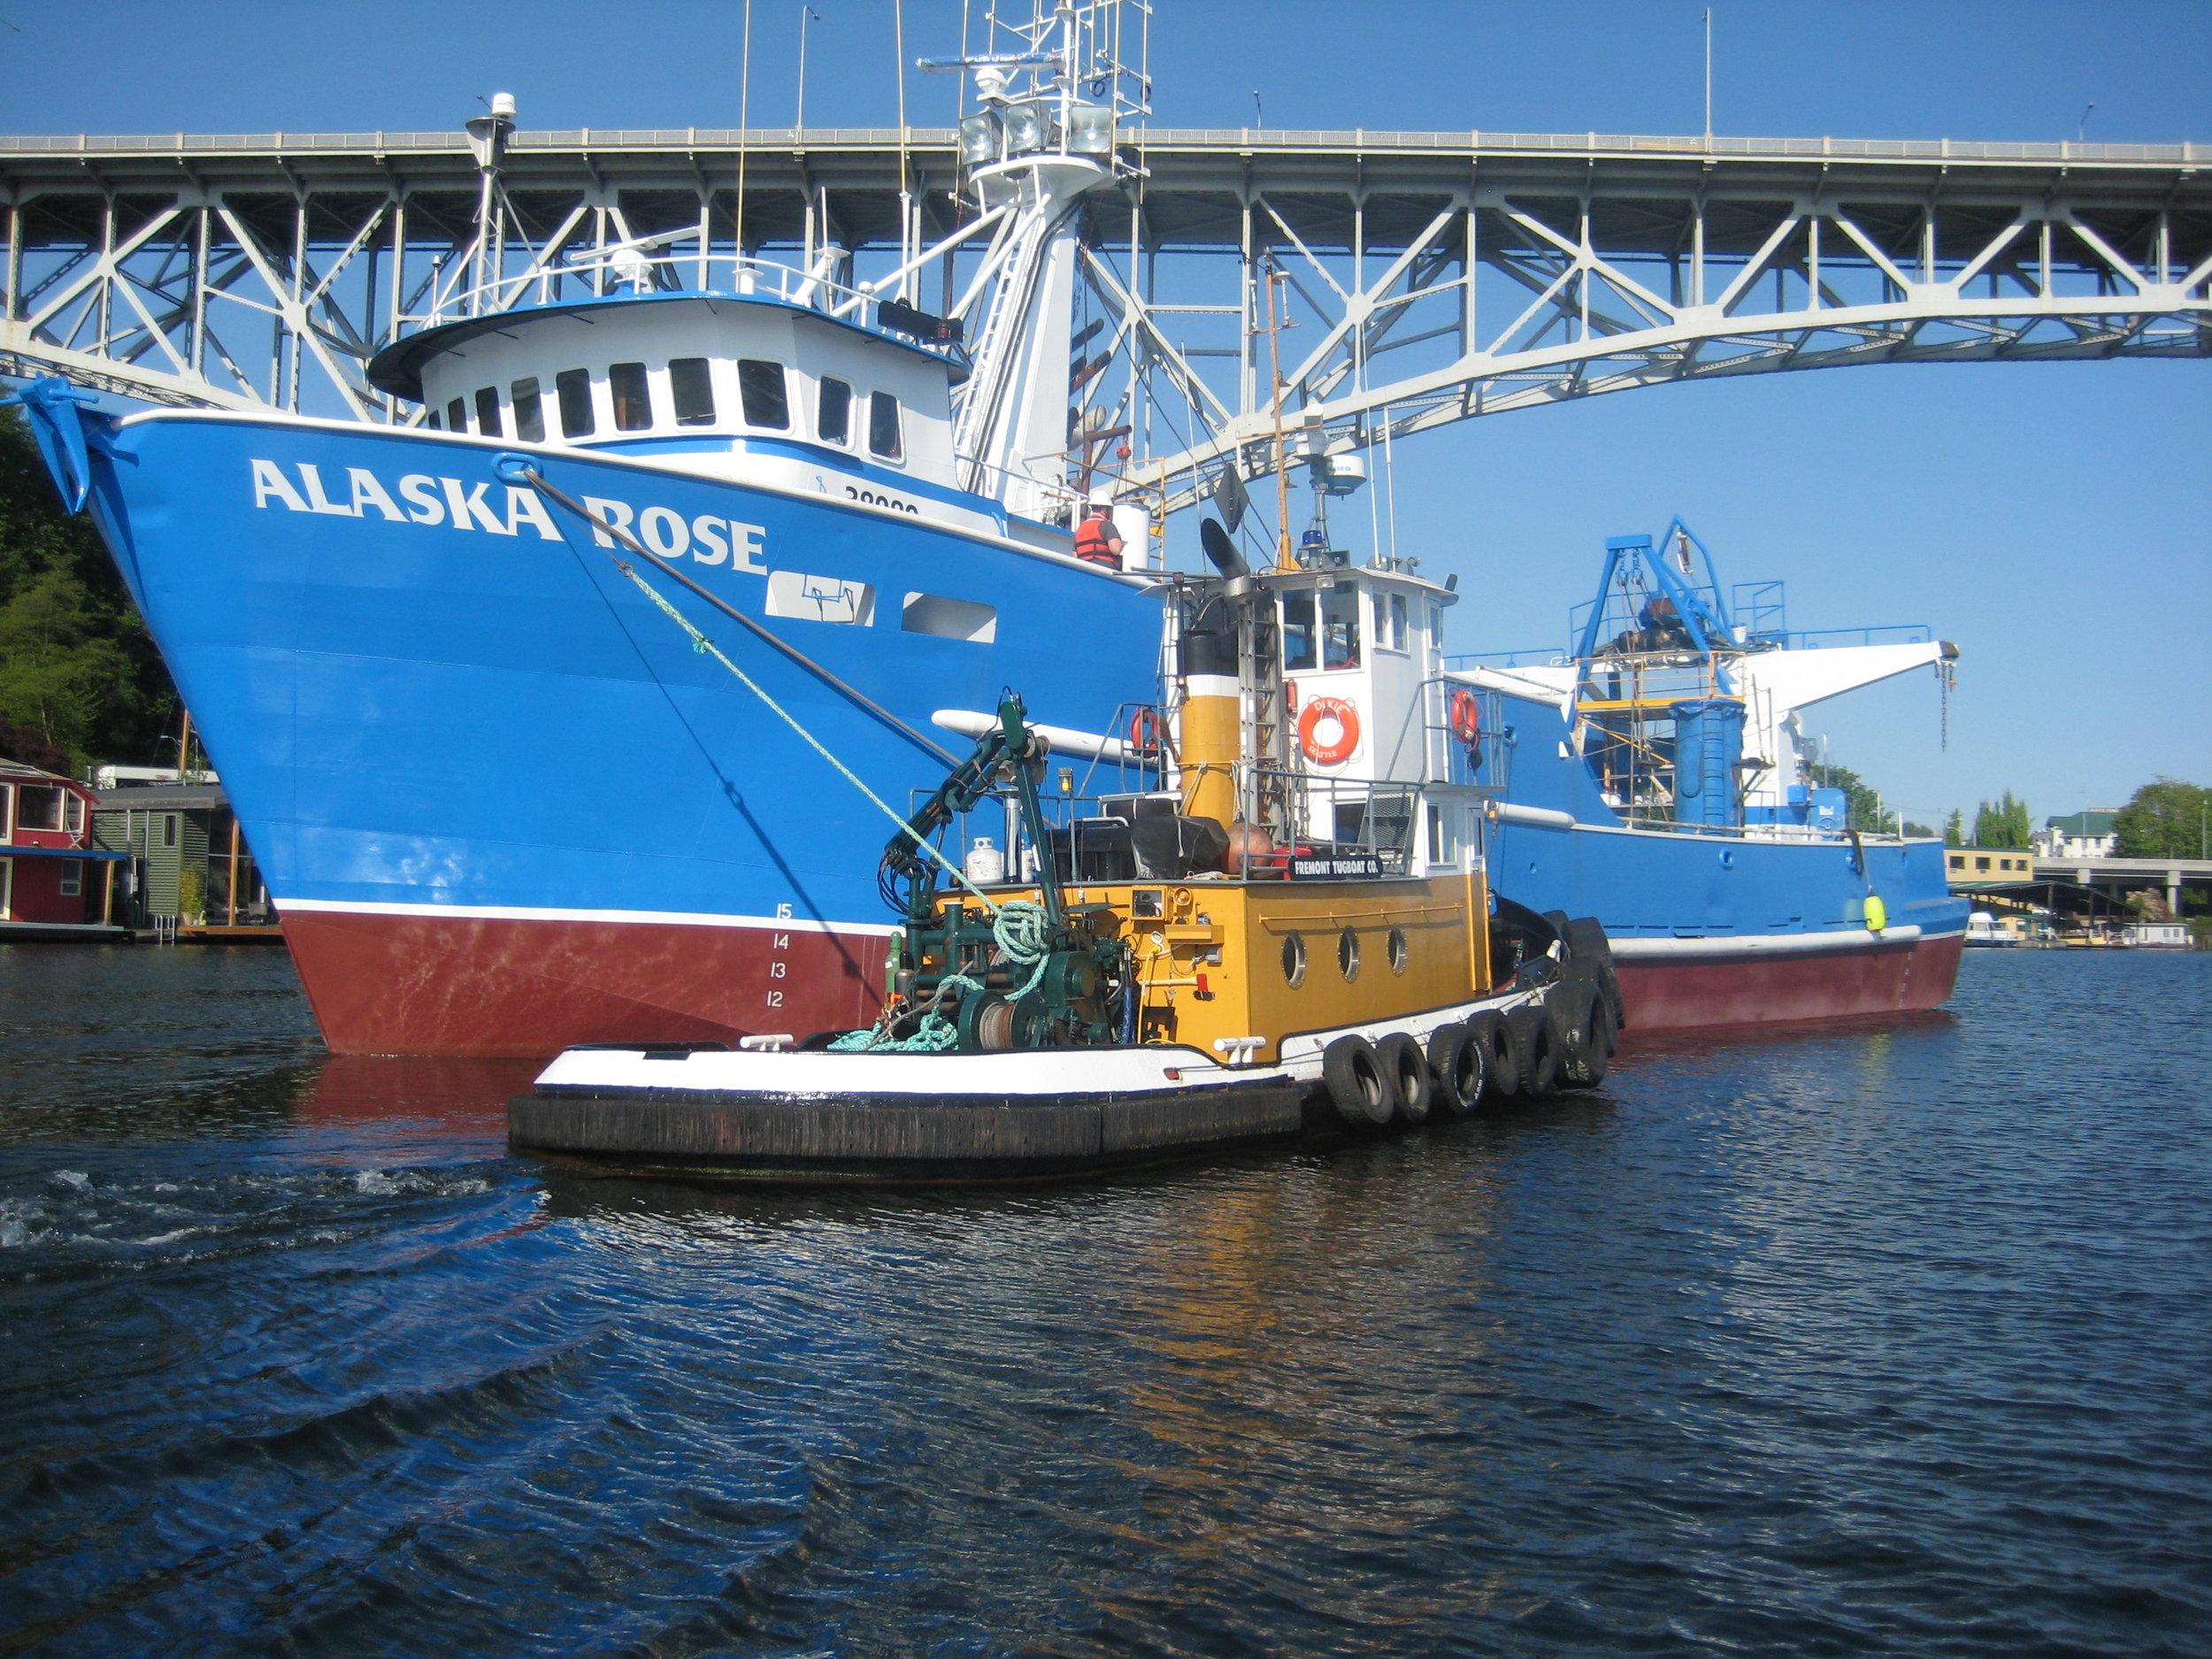 Dixie with Alaska Rose heading for Ballard